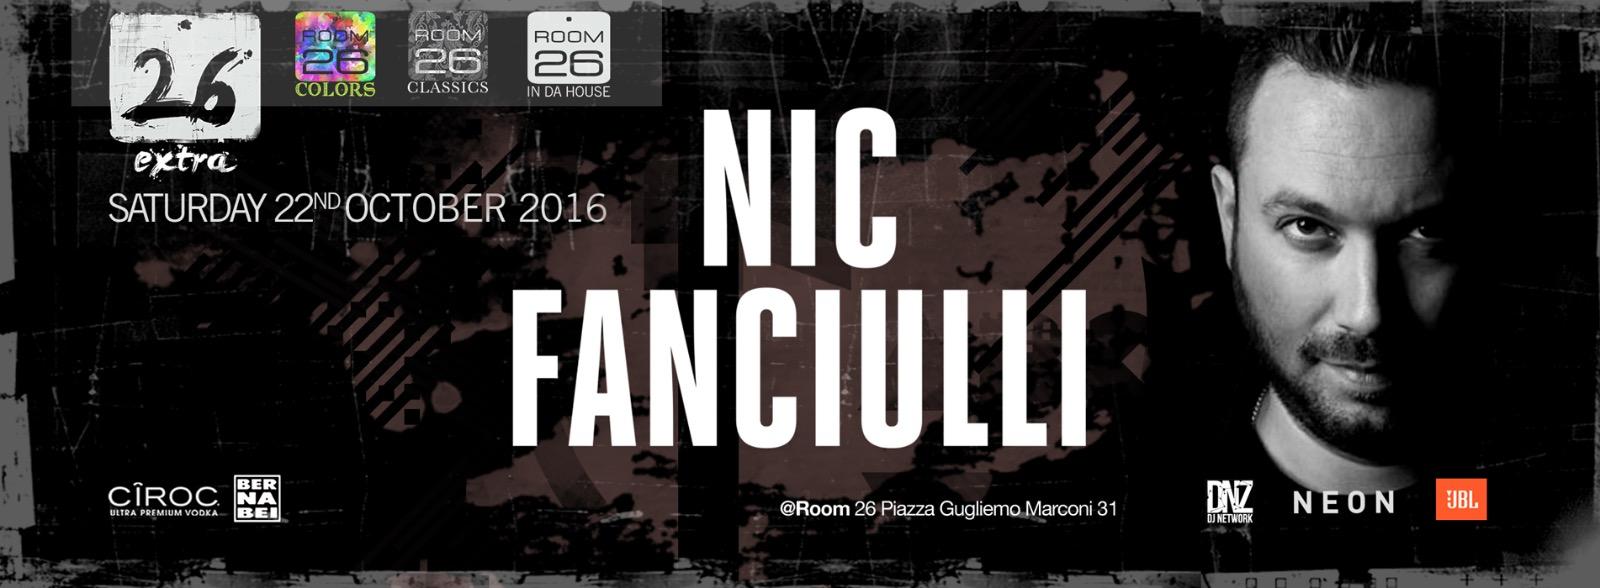 Room 26 Roma Nic Fanciulli sabato 22 10 2016